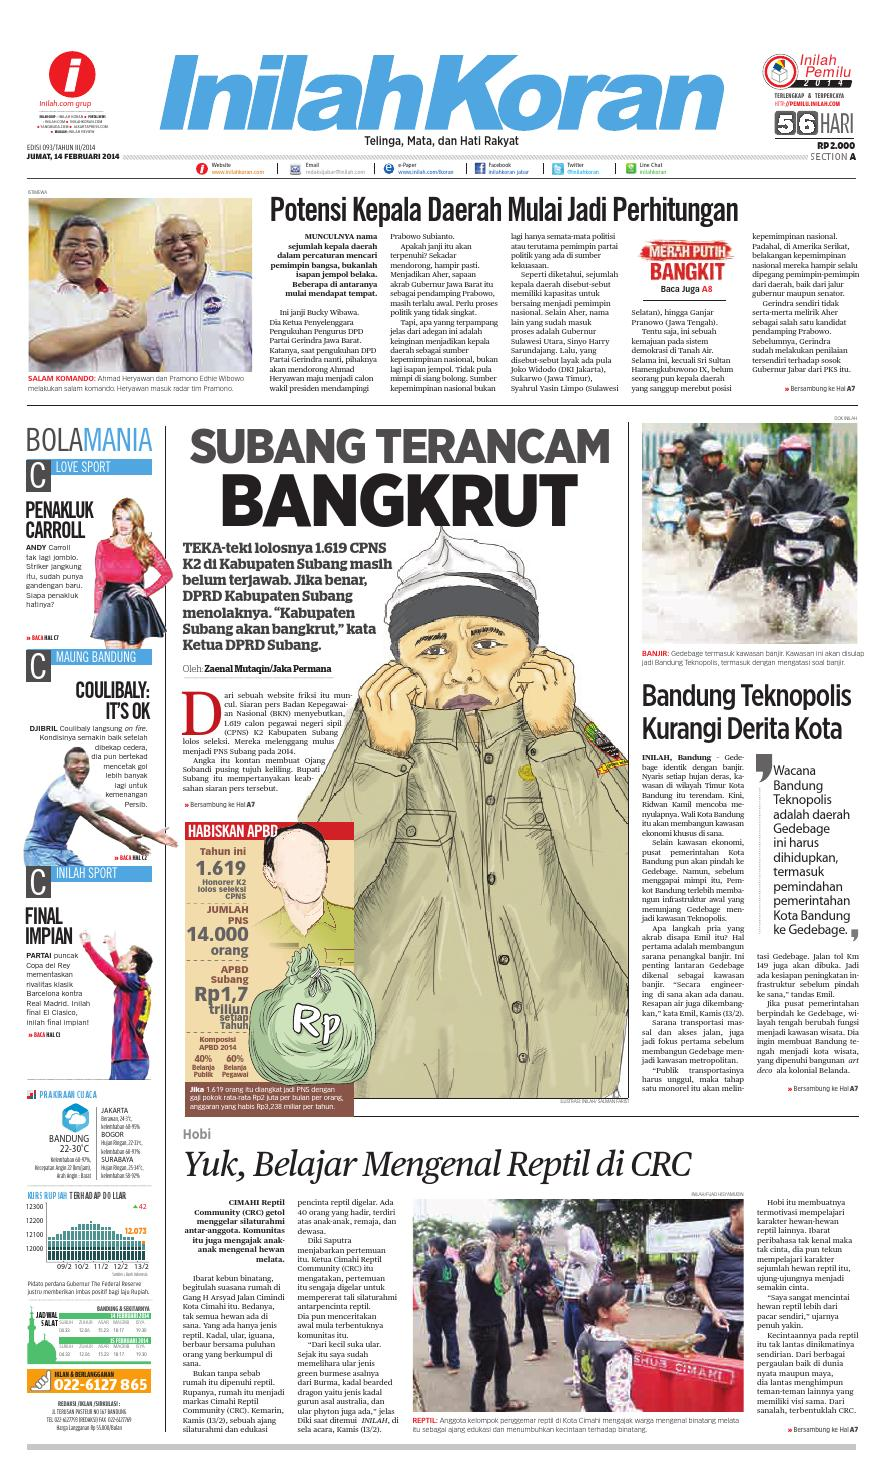 SUBANG TERANCAM BANGKRUT by inilah koran - issuu 6506f1f778